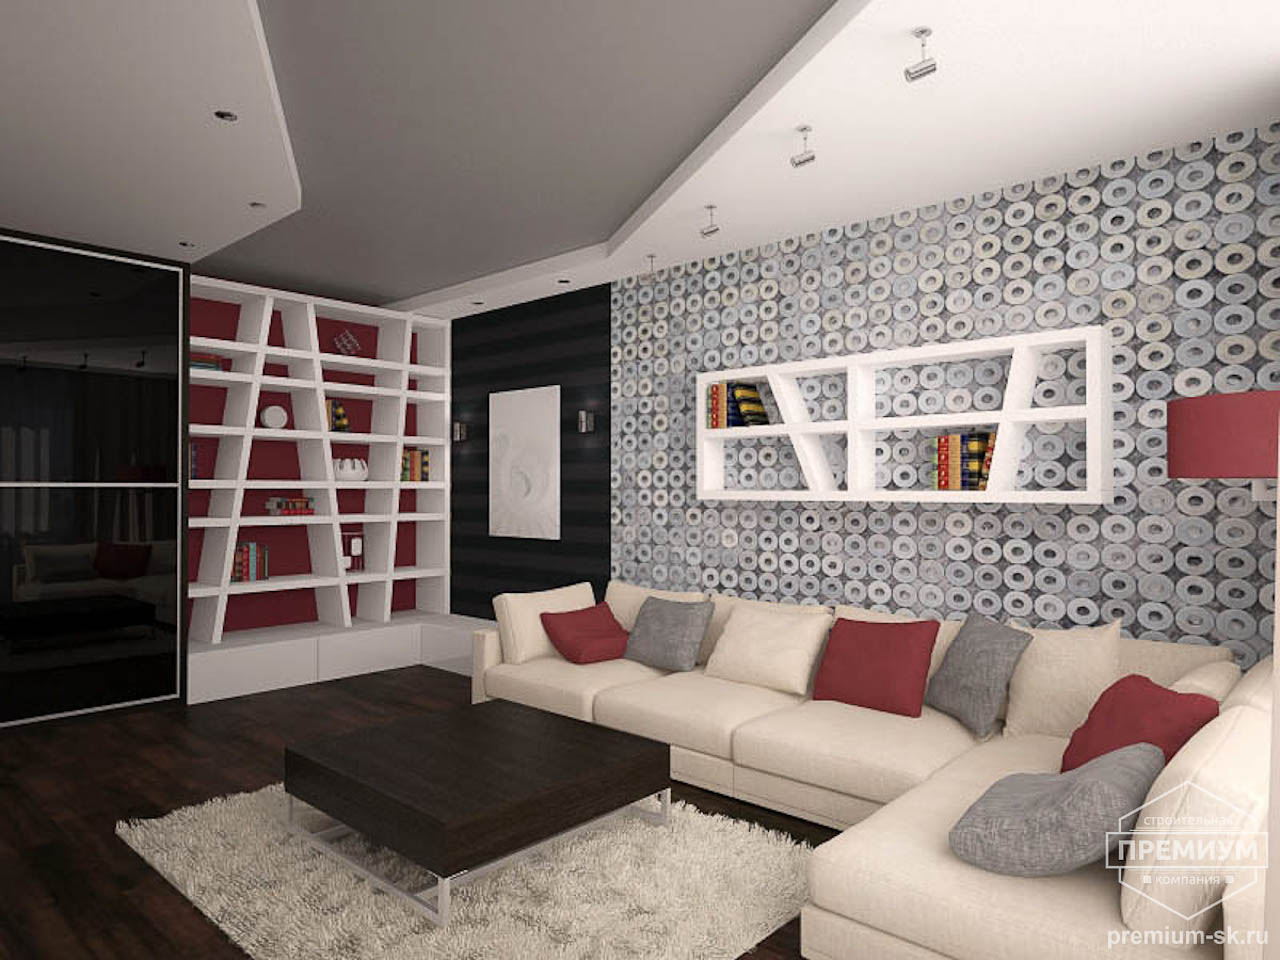 Дизайн интерьера однокомнатной квартиры по ул. Сыромолотова 11 img40905423